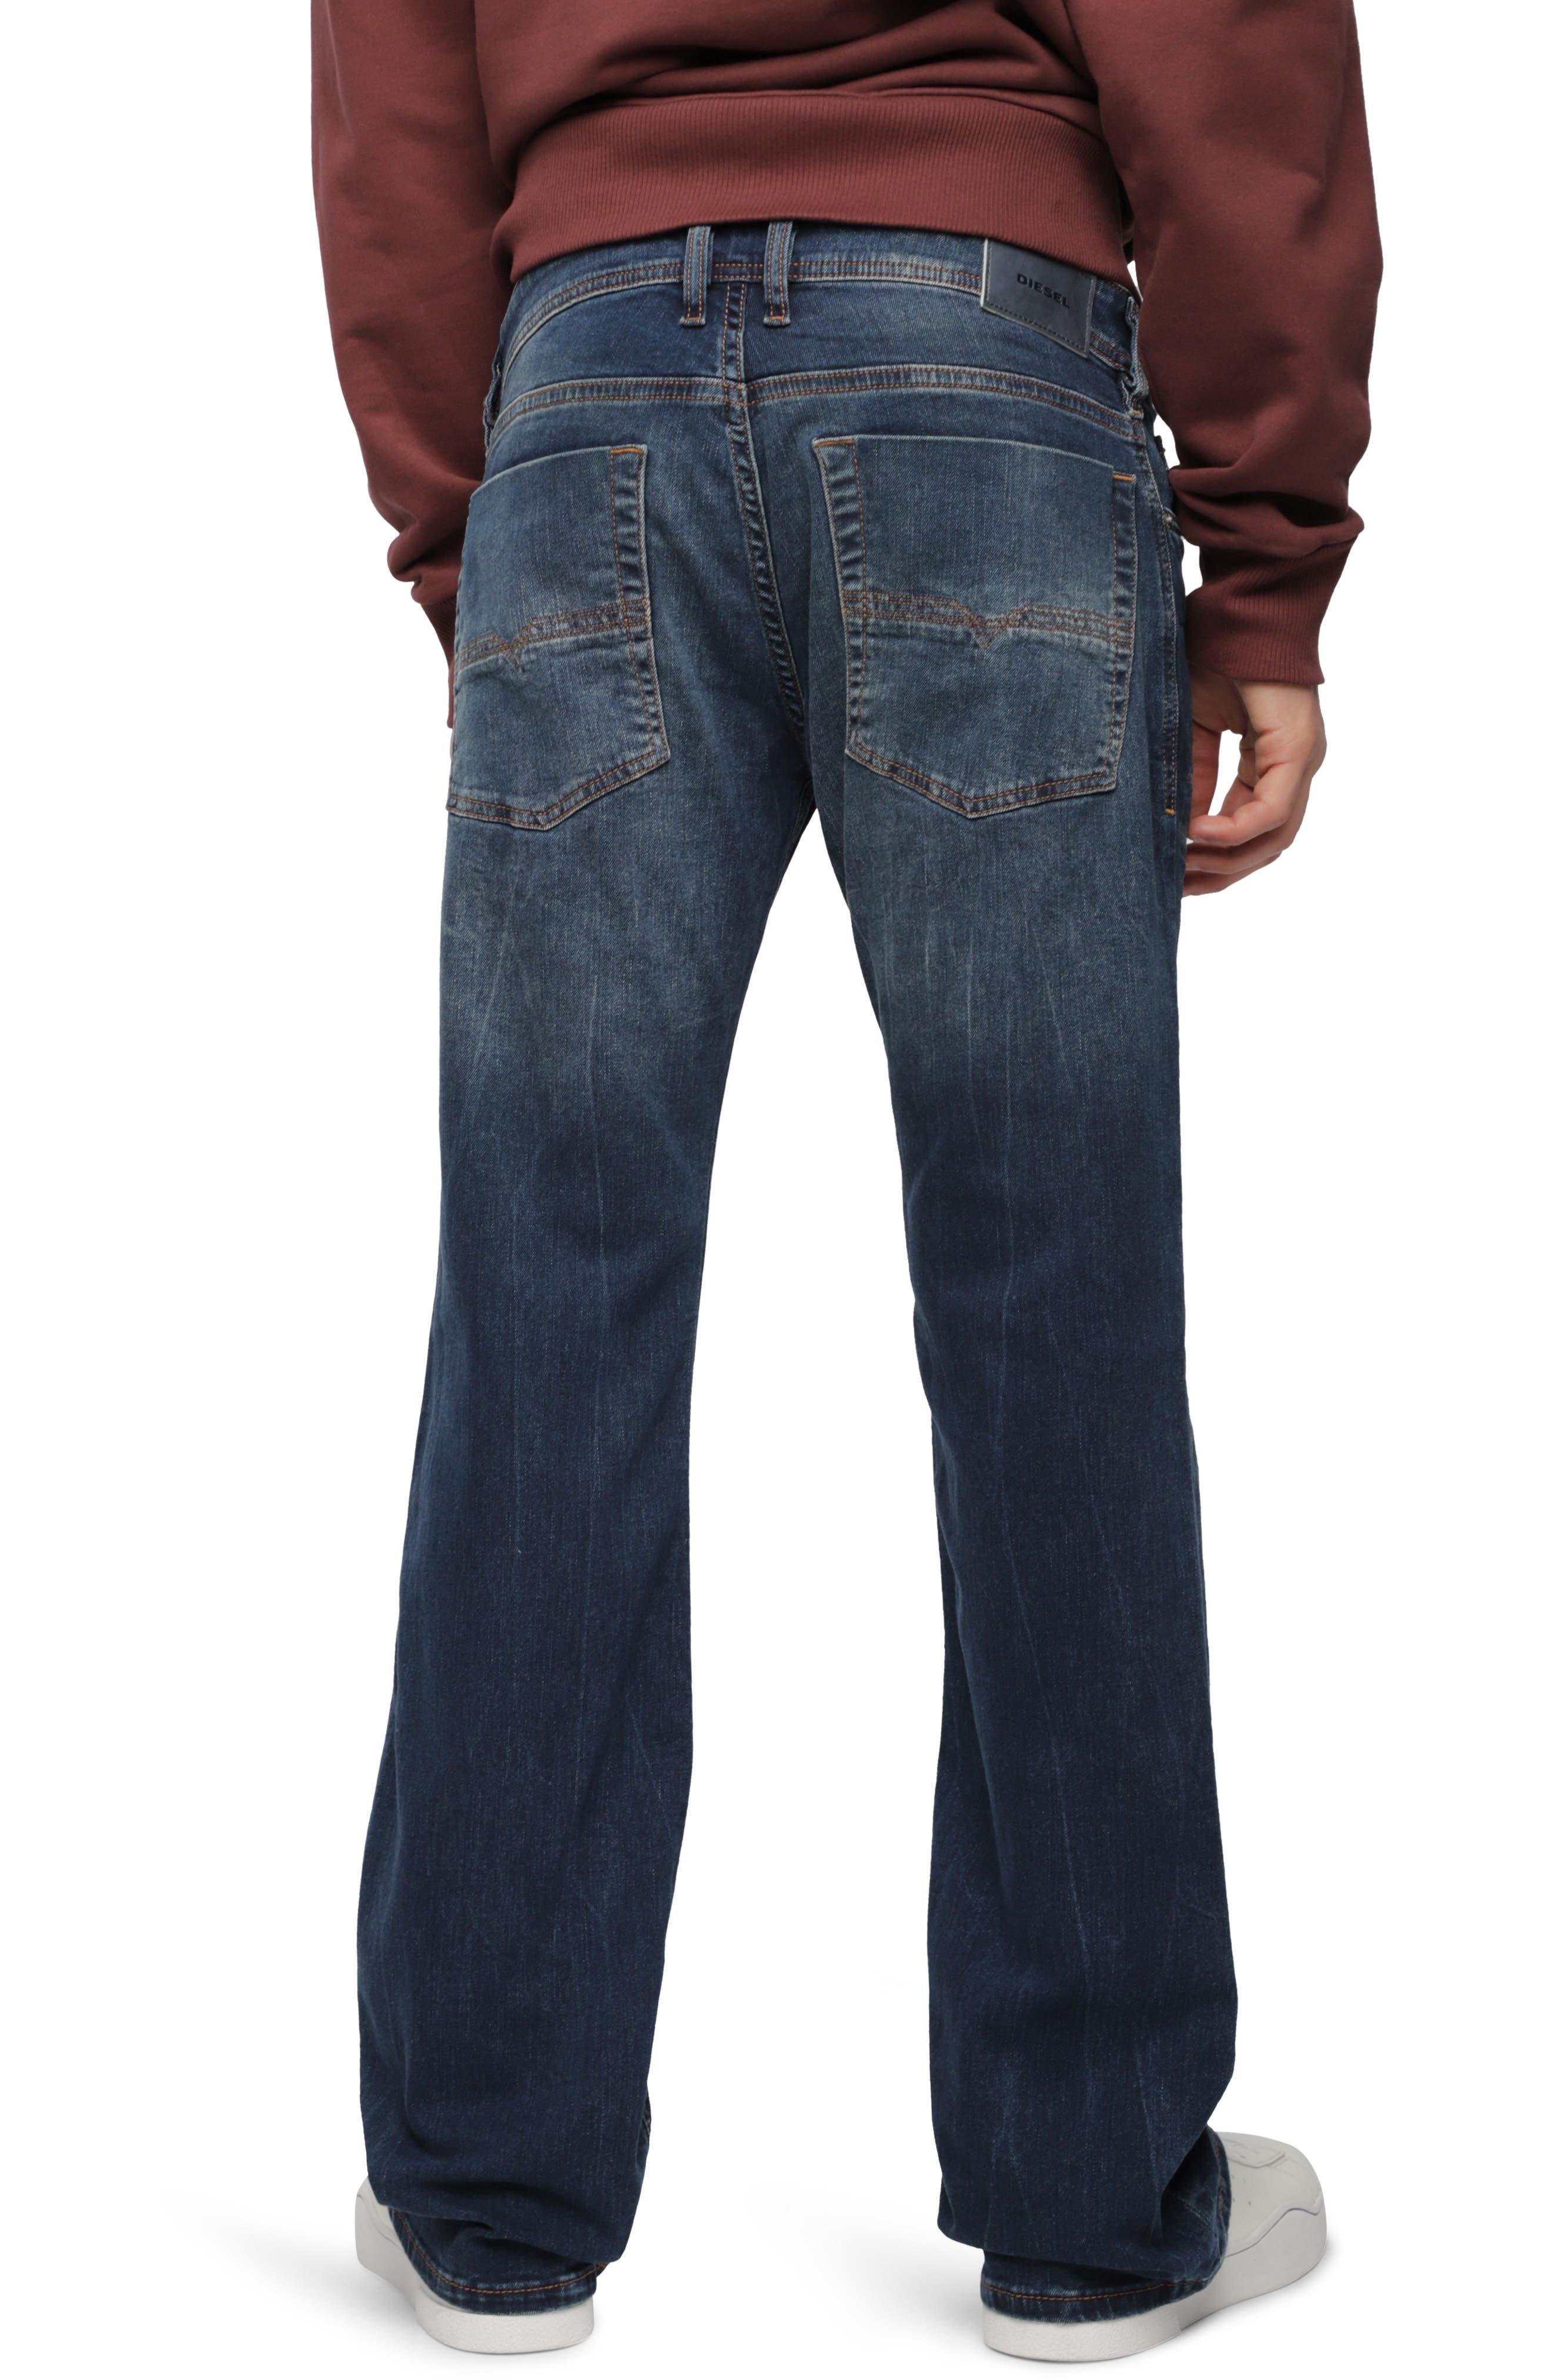 Zatiny Bootcut Jeans,                             Alternate thumbnail 2, color,                             400